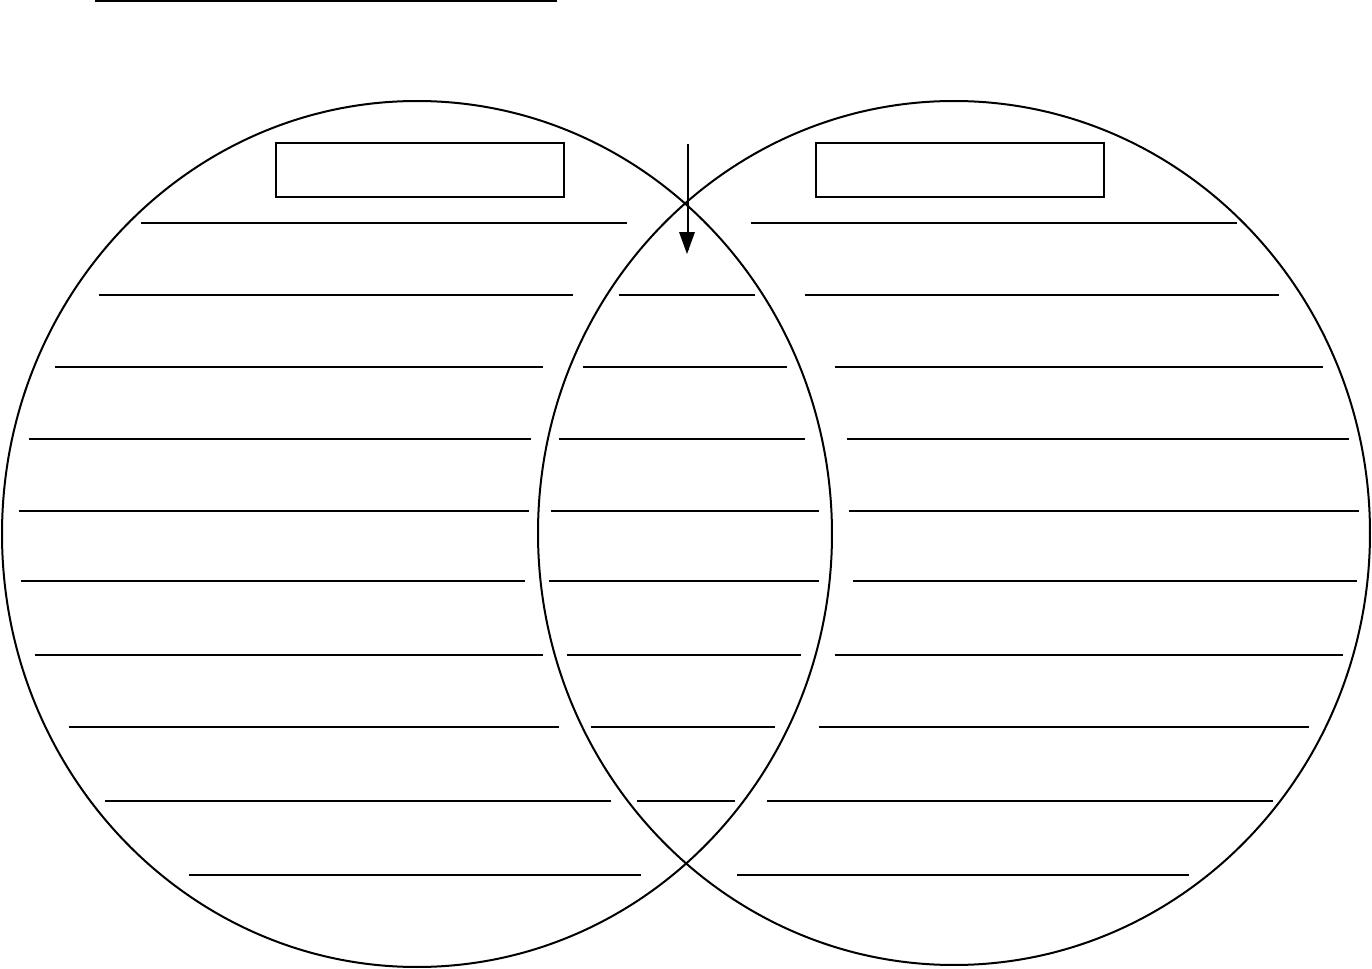 Free graphic organizers venn diagram romeondinez free graphic organizers venn diagram ccuart Images